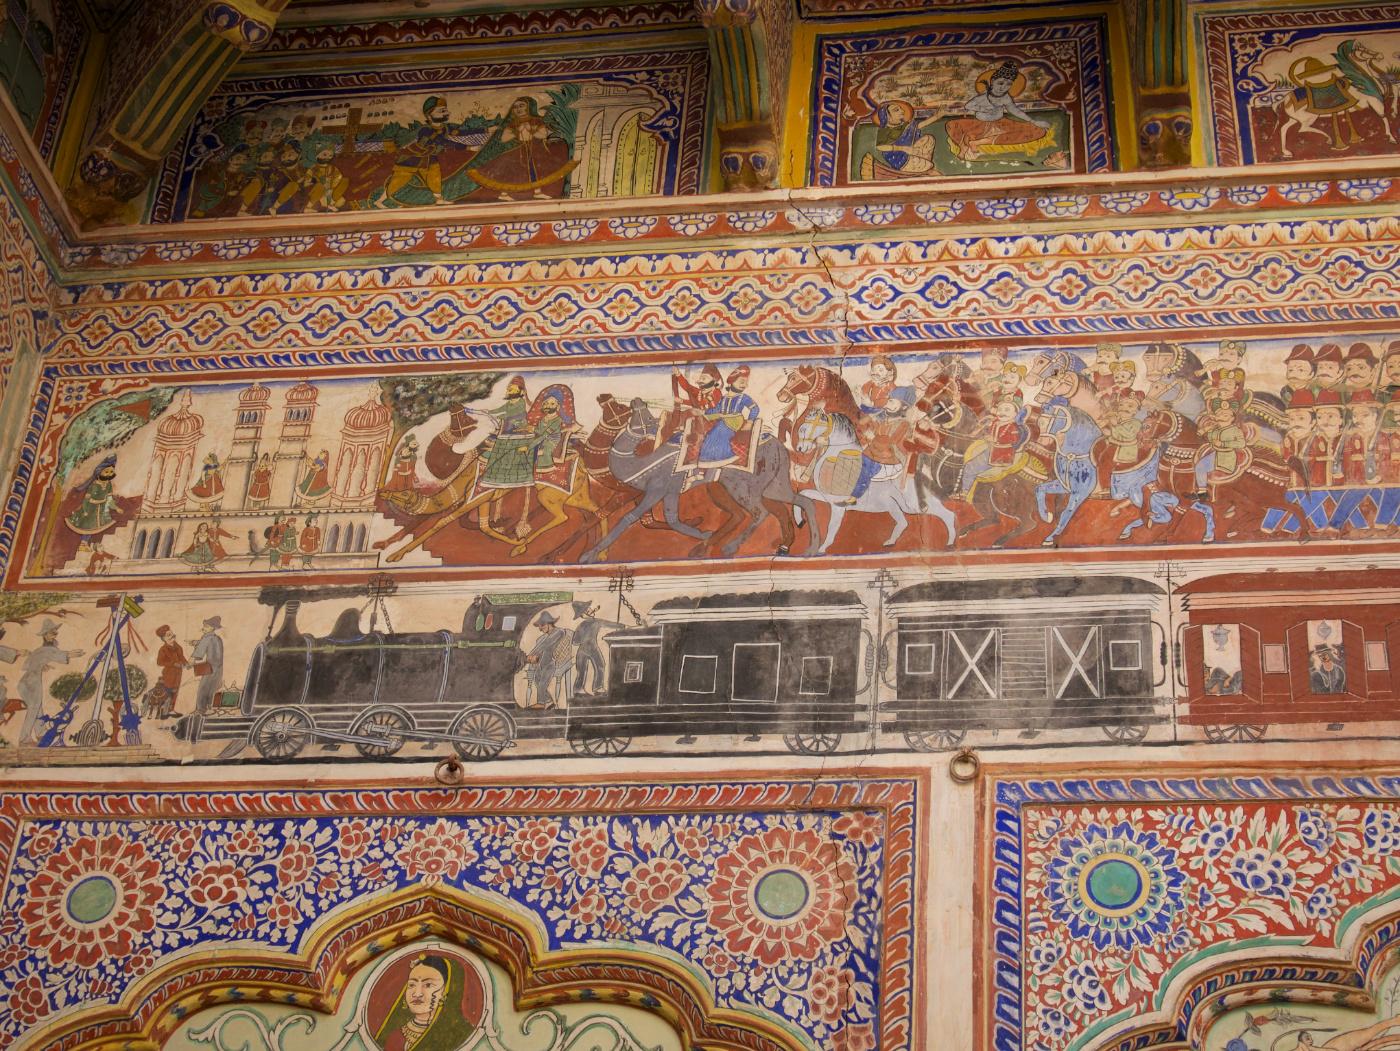 313-India-Nawalgarh